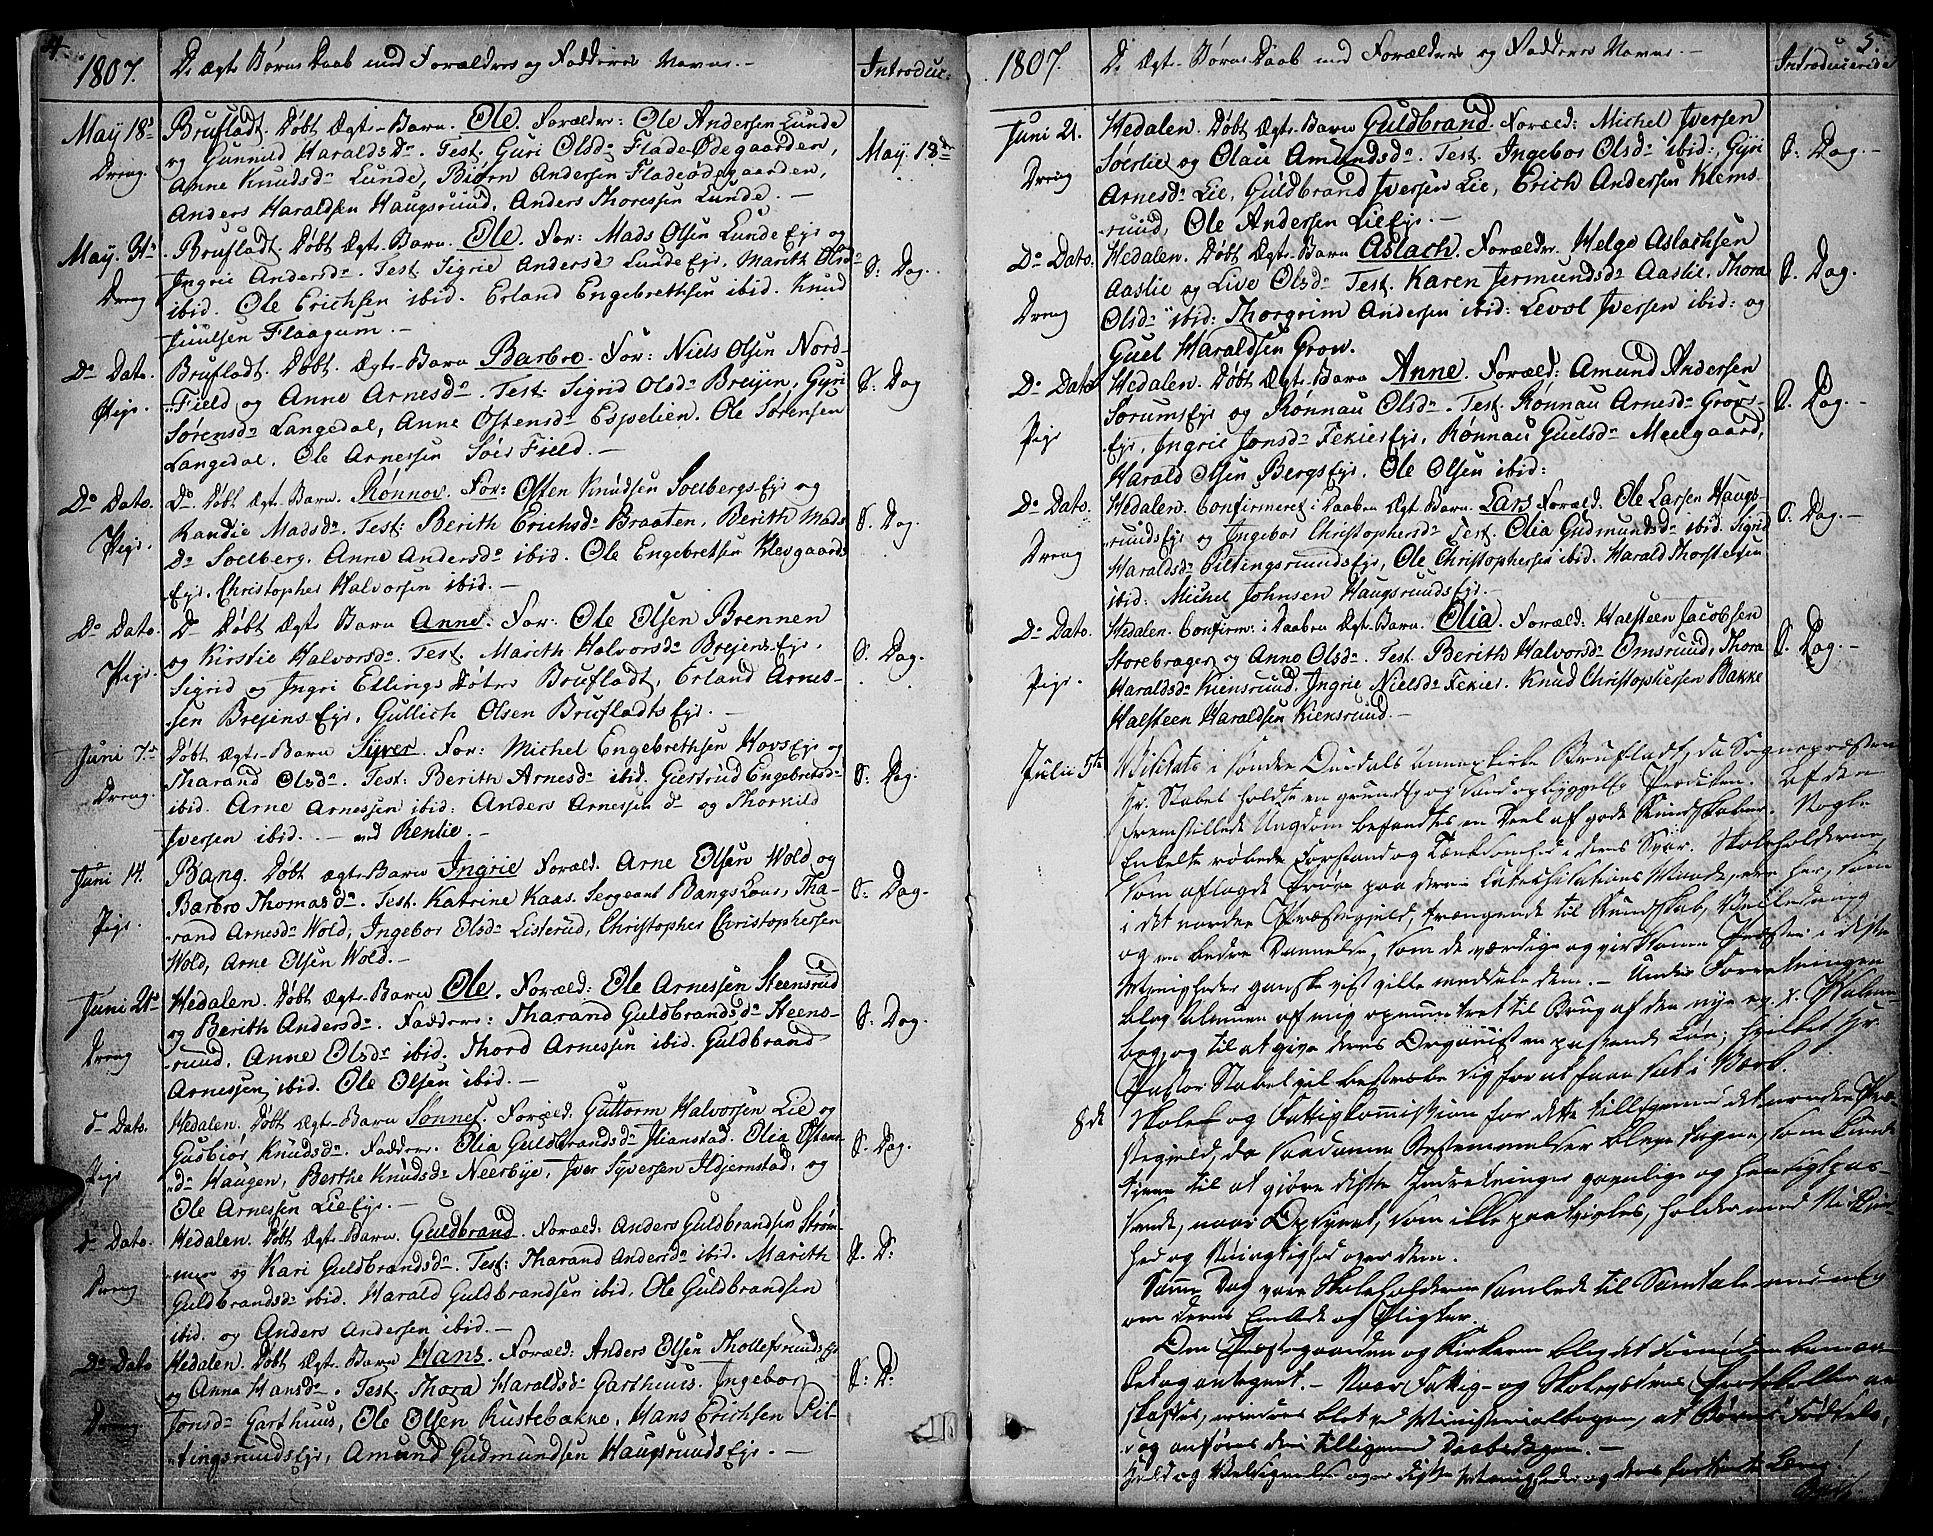 SAH, Sør-Aurdal prestekontor, Parish register (official) no. 1, 1807-1815, p. 4-5